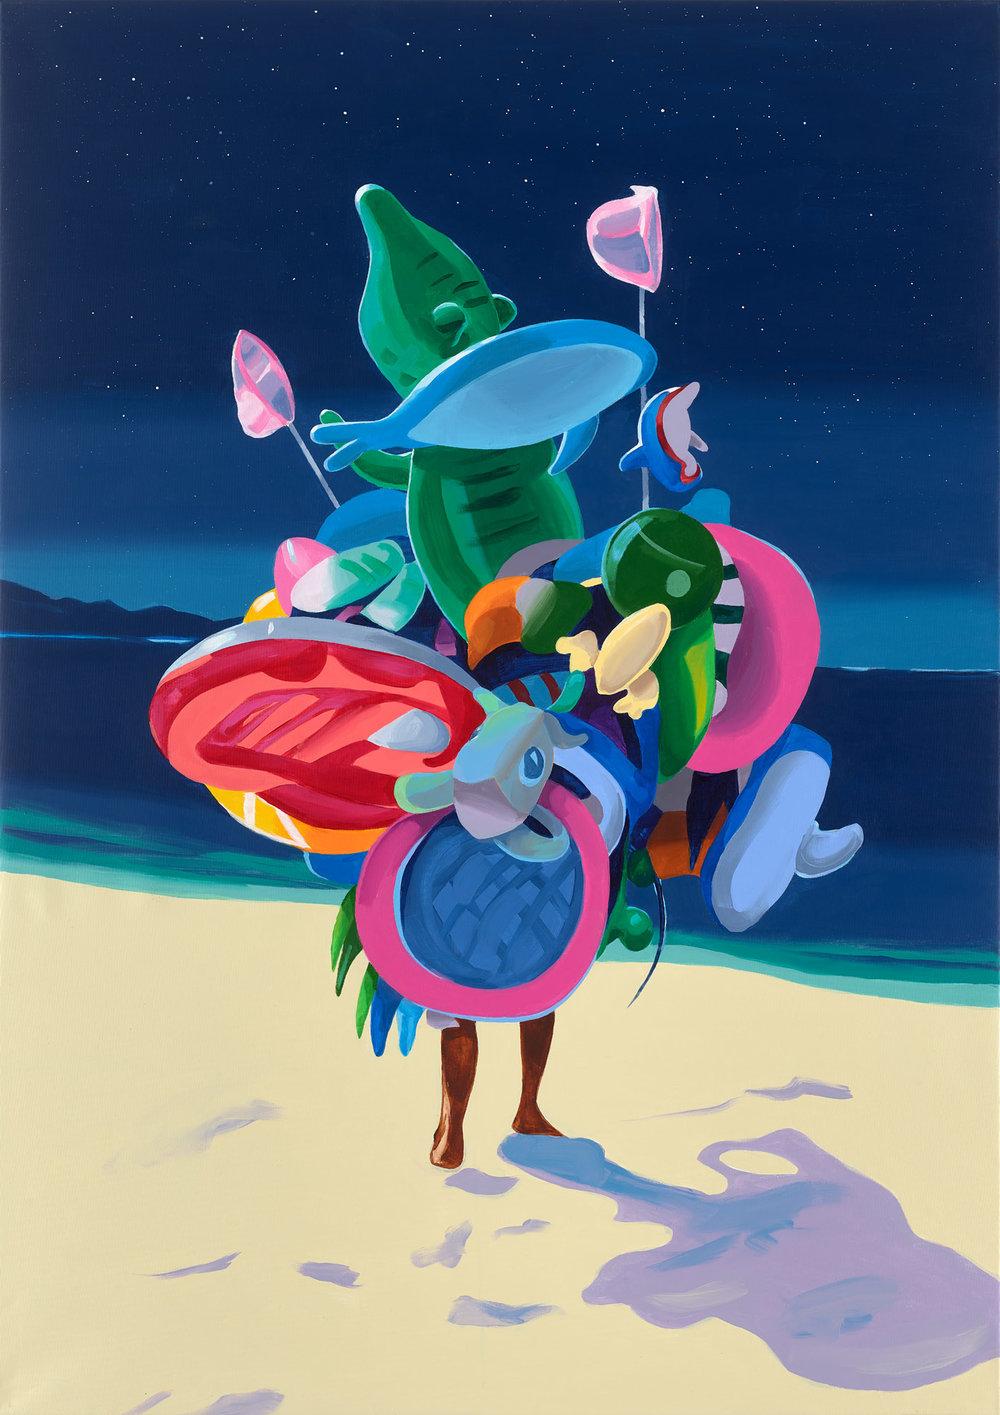 Christopher Winter The Landing, 2019 Acrylic on Canvas, 170 x 120 cm